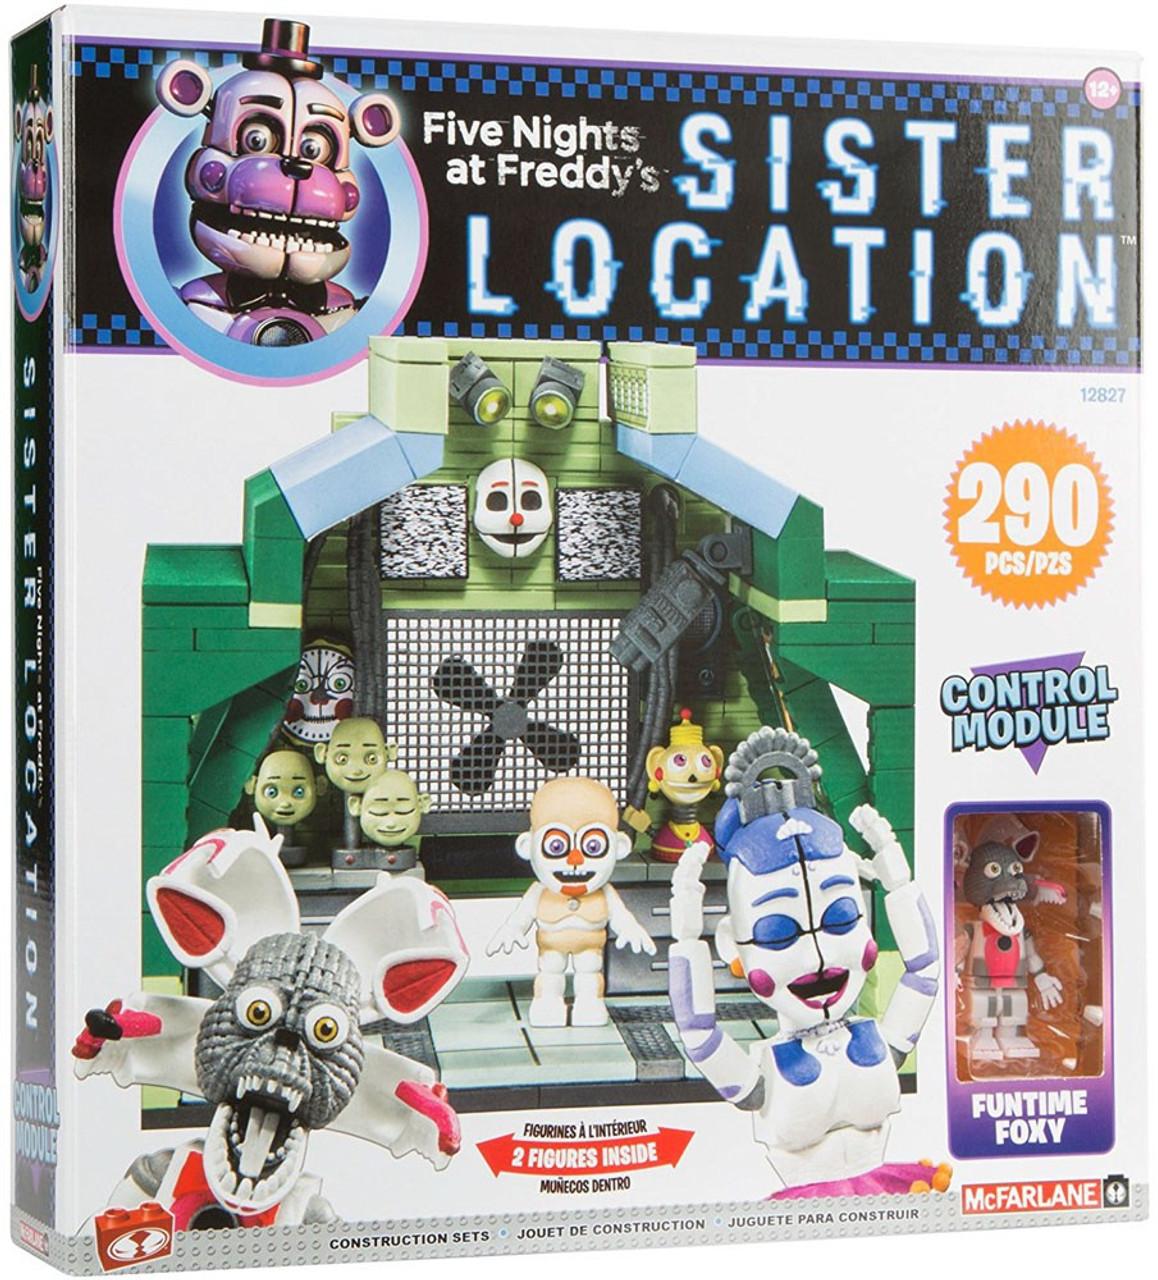 McFarlane Toys Five Nights at Freddys Control Module Large